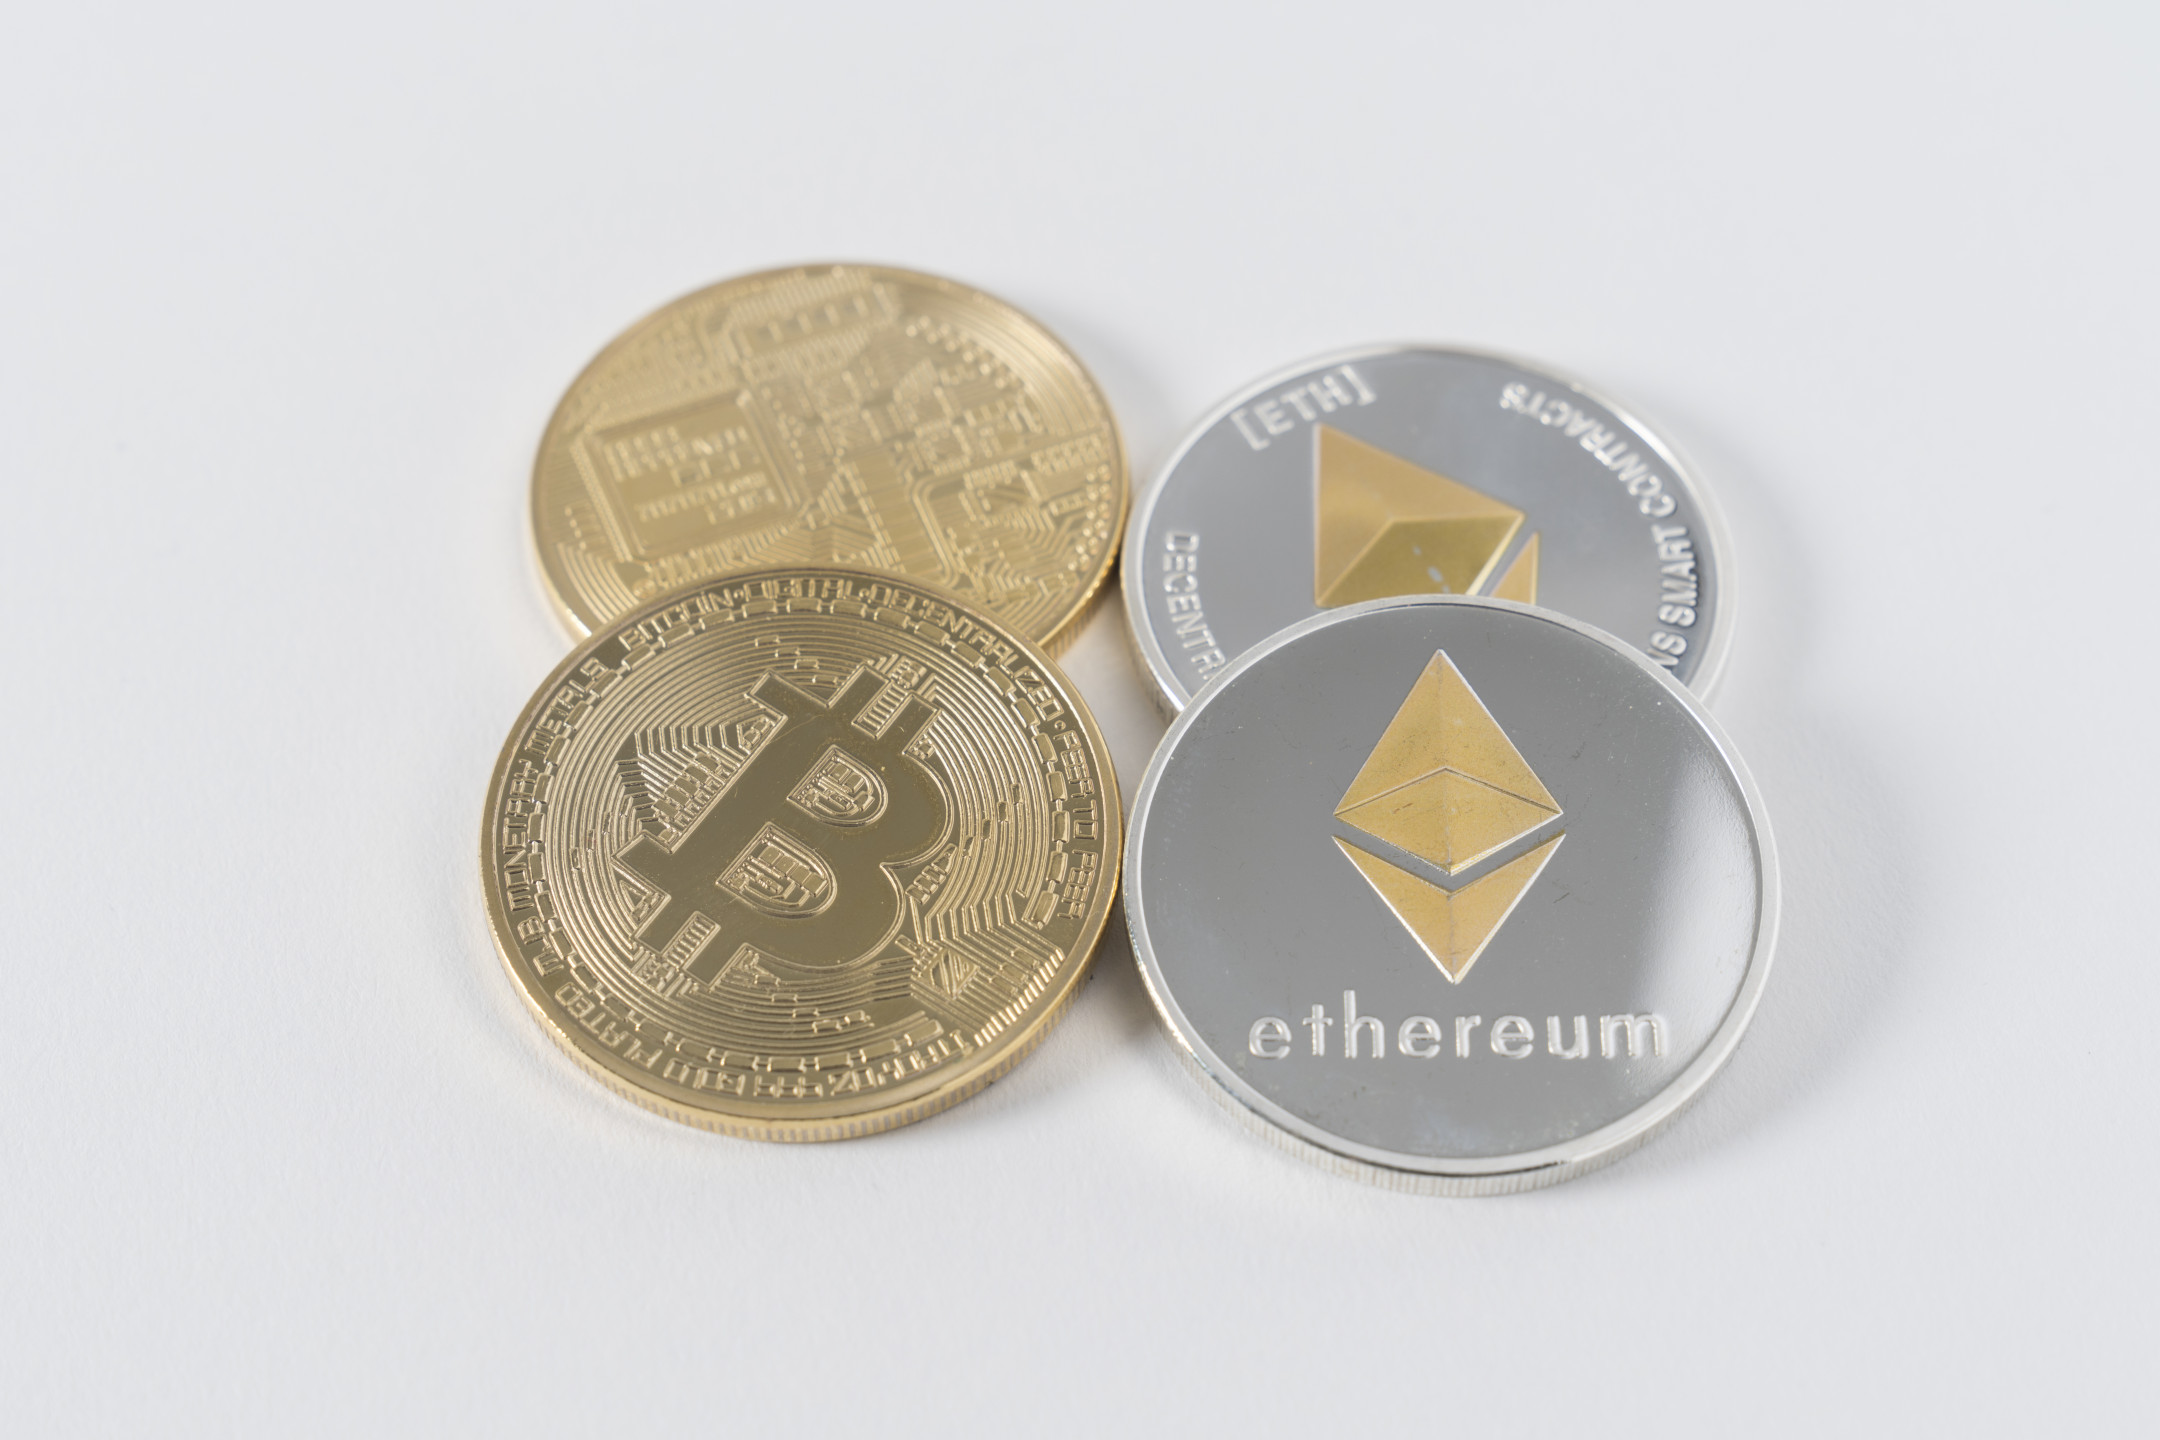 Vitalik Buterin explains benefits of a high Ethereum price